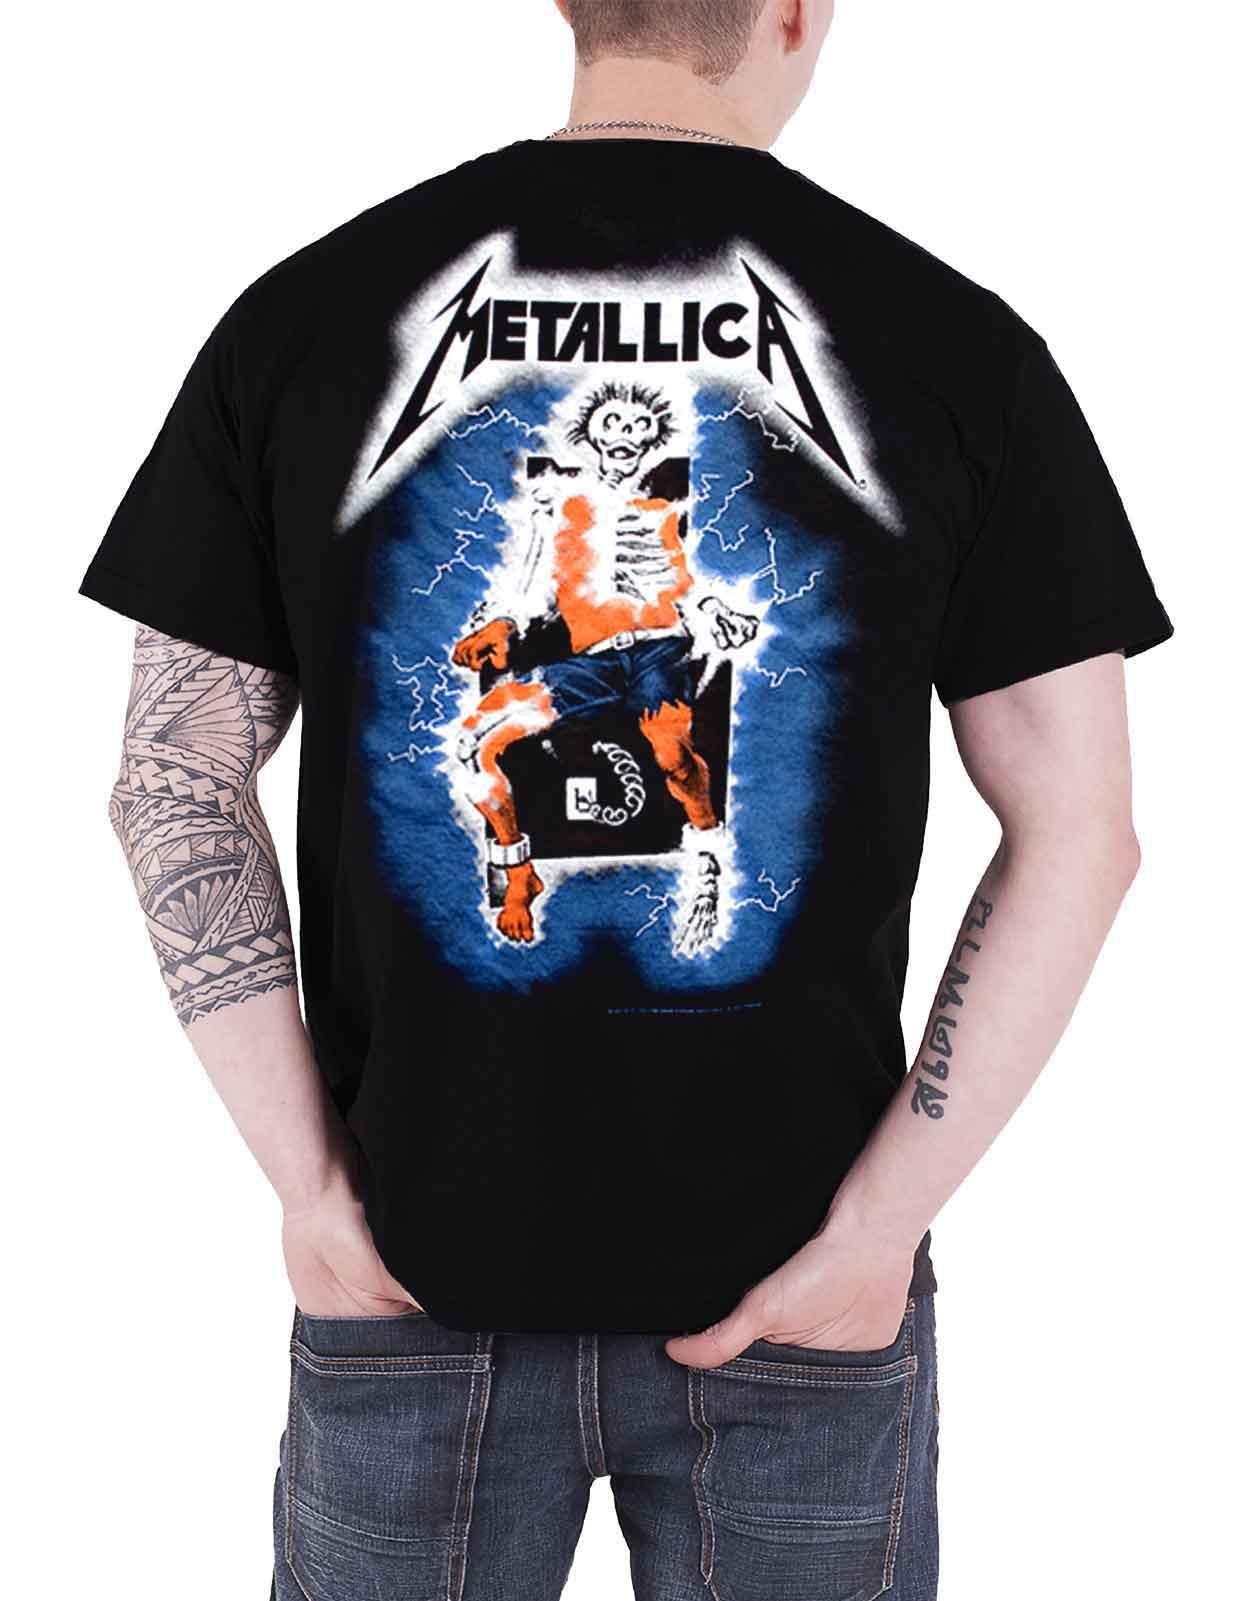 Officiel-Metallica-T-shirt-filaire-justice-for-all-RTL-Band-Logo-Homme-Nouveau miniature 29